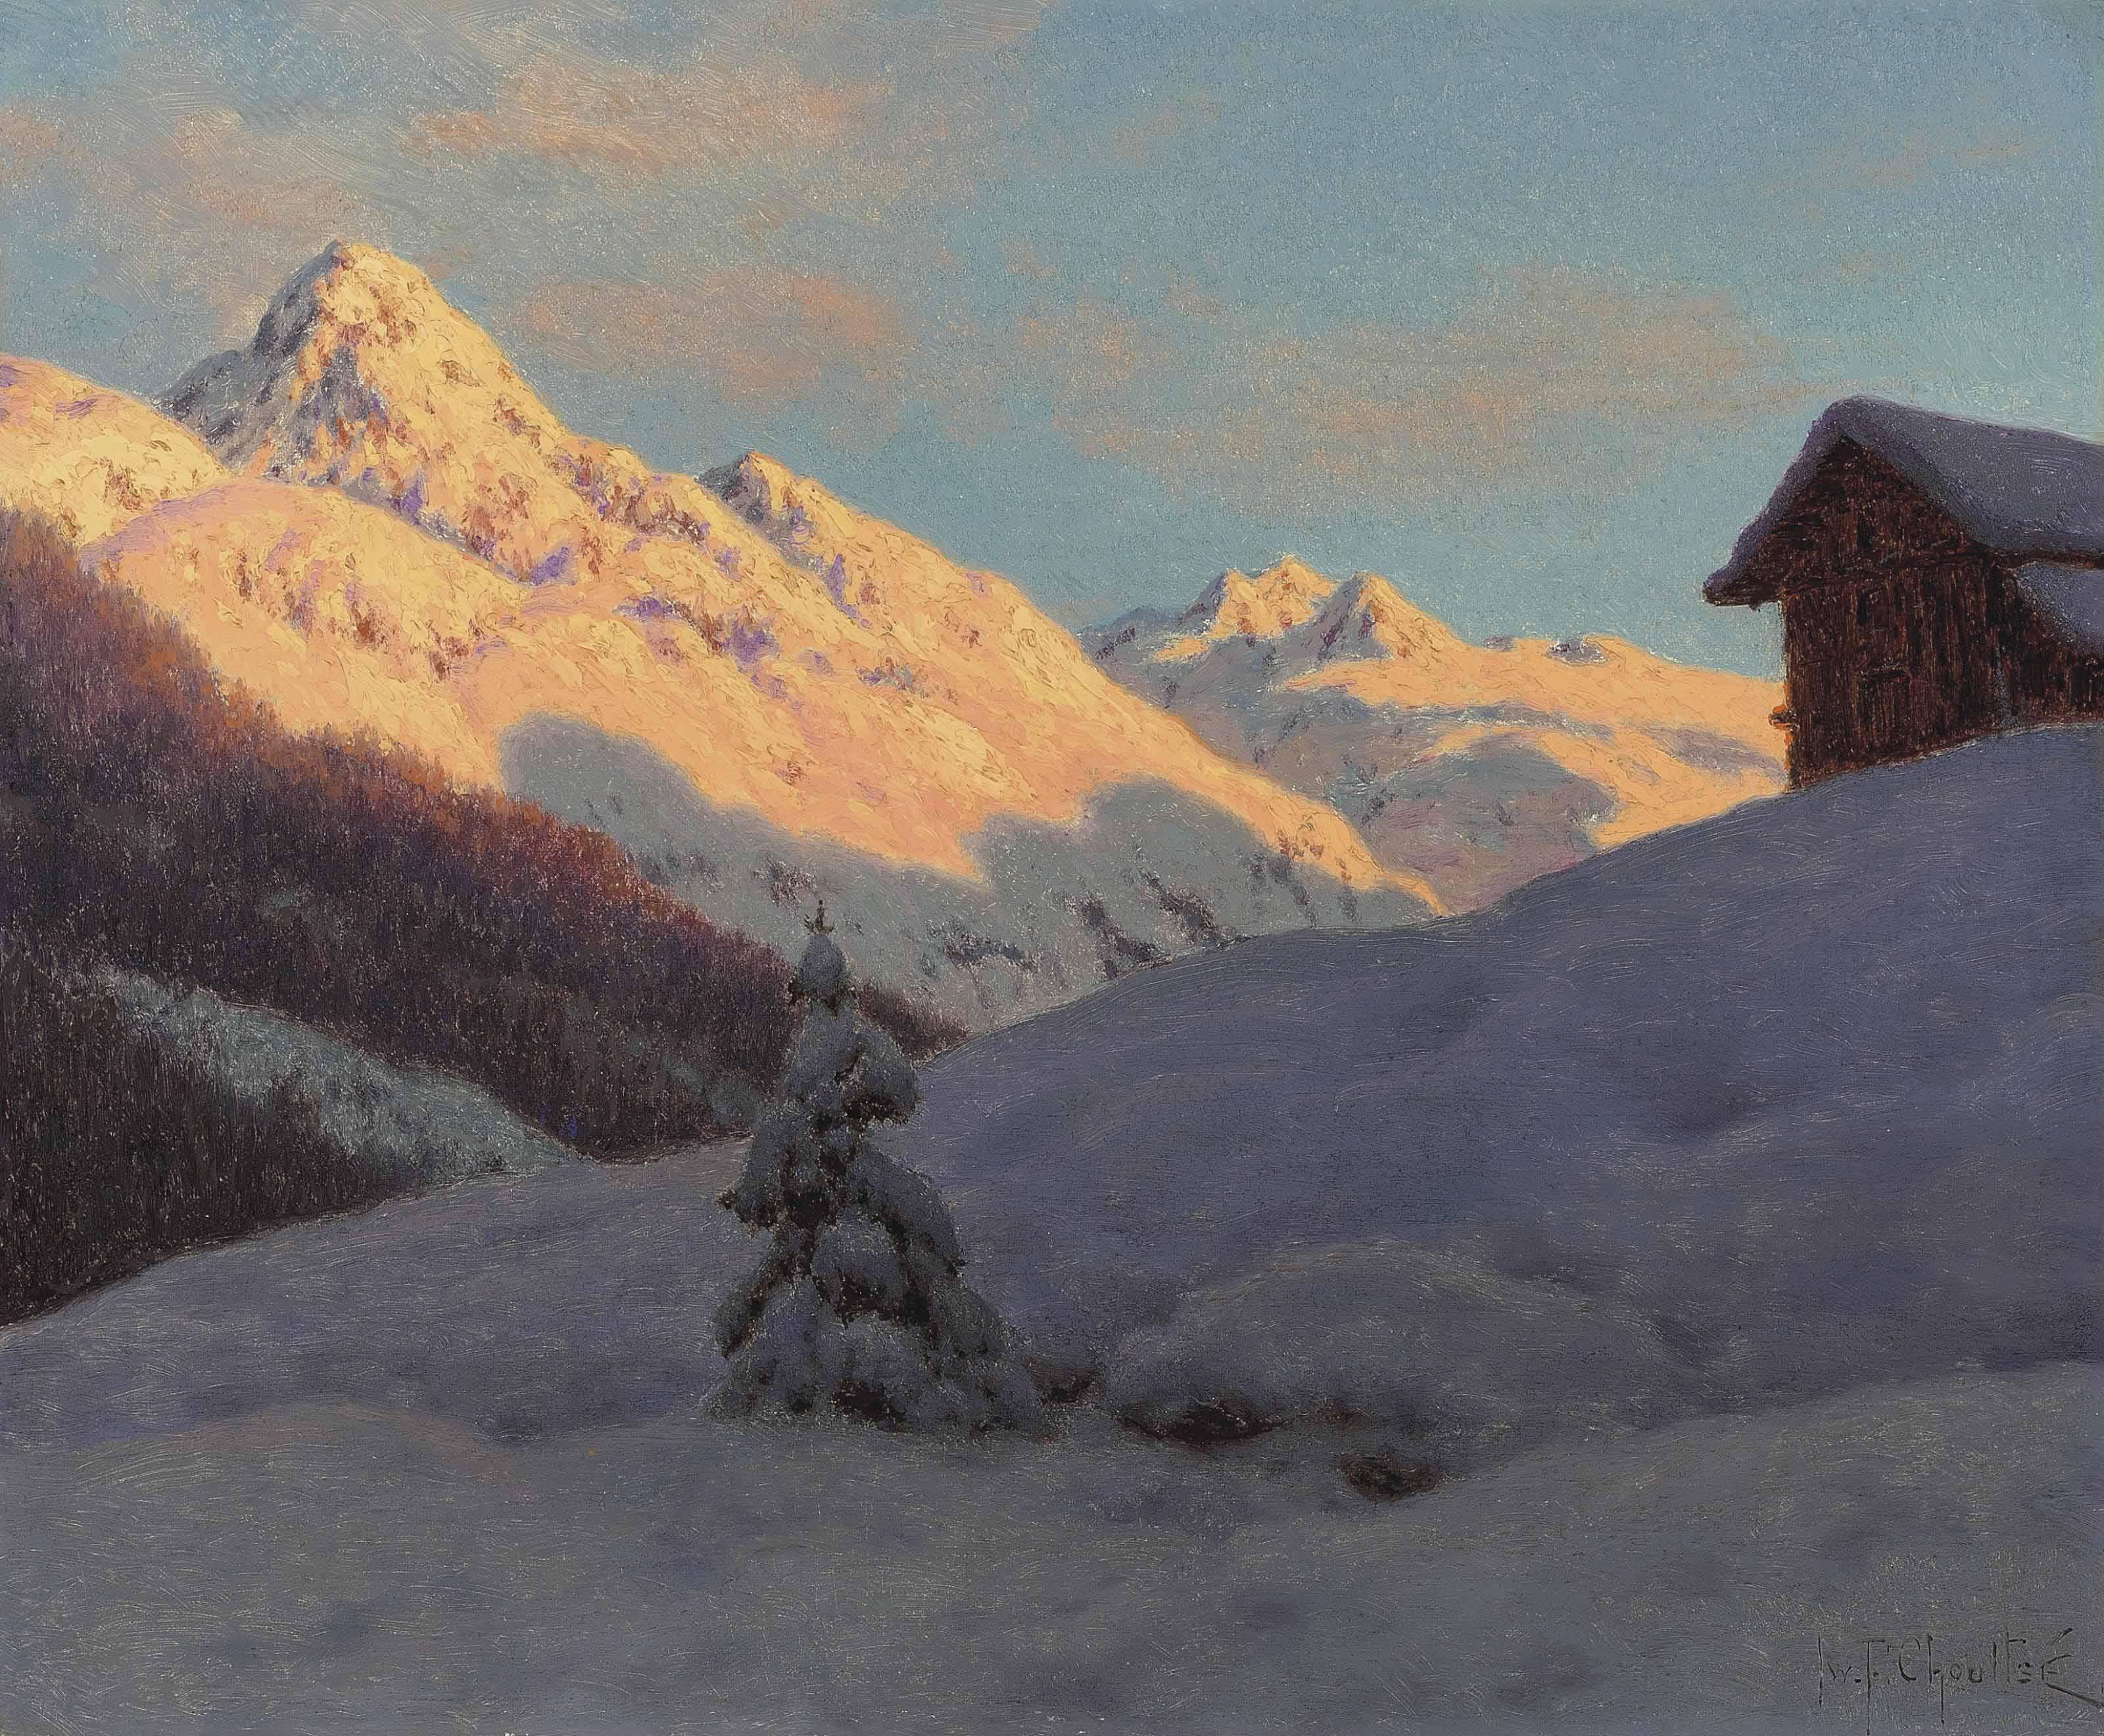 Peaks in the Engadine